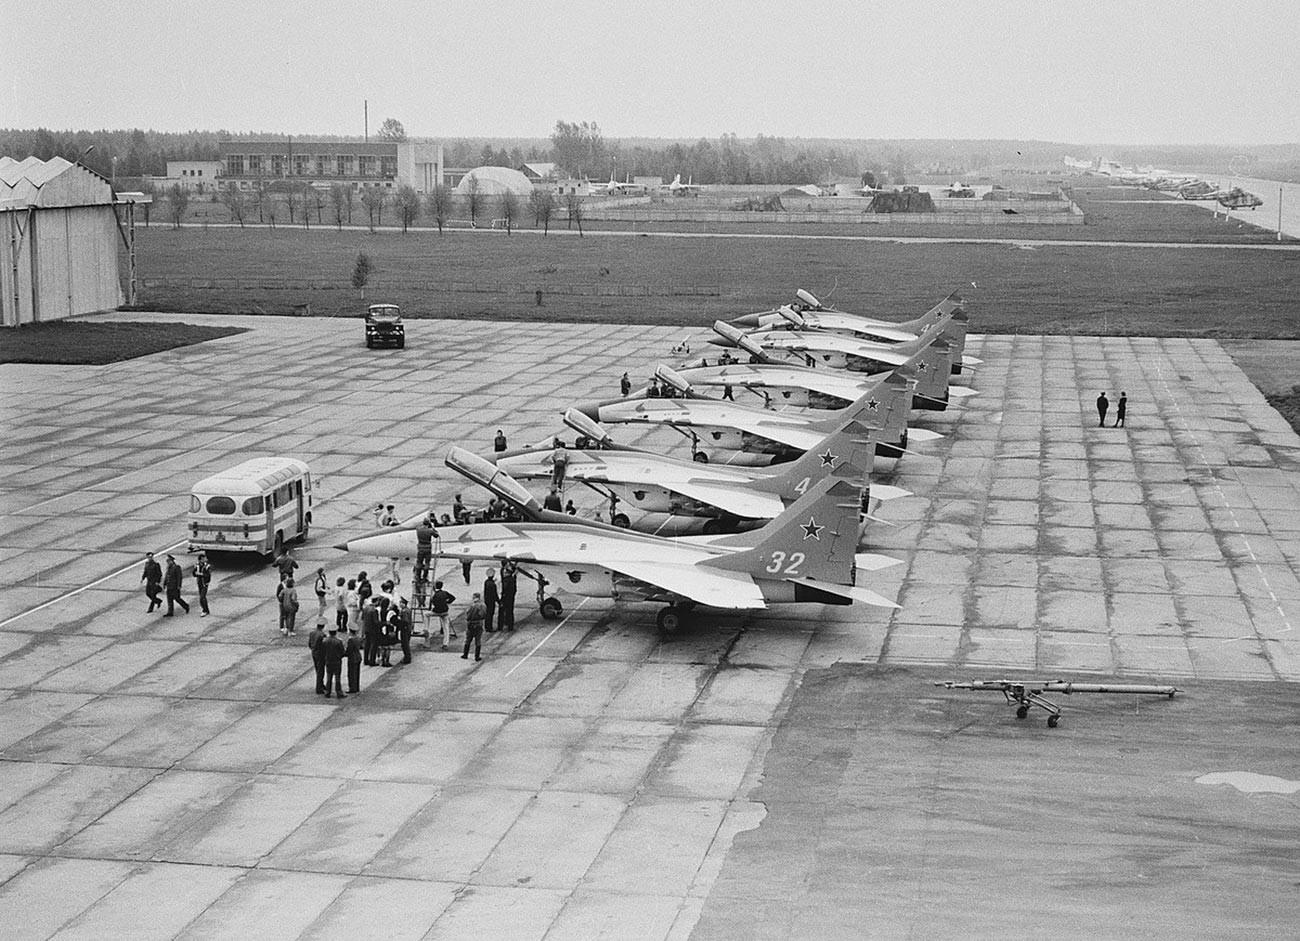 "Оригинална екипа акробатске групе ""Стрижи"" у ваздухопловној бази Кубинка, април 1992."